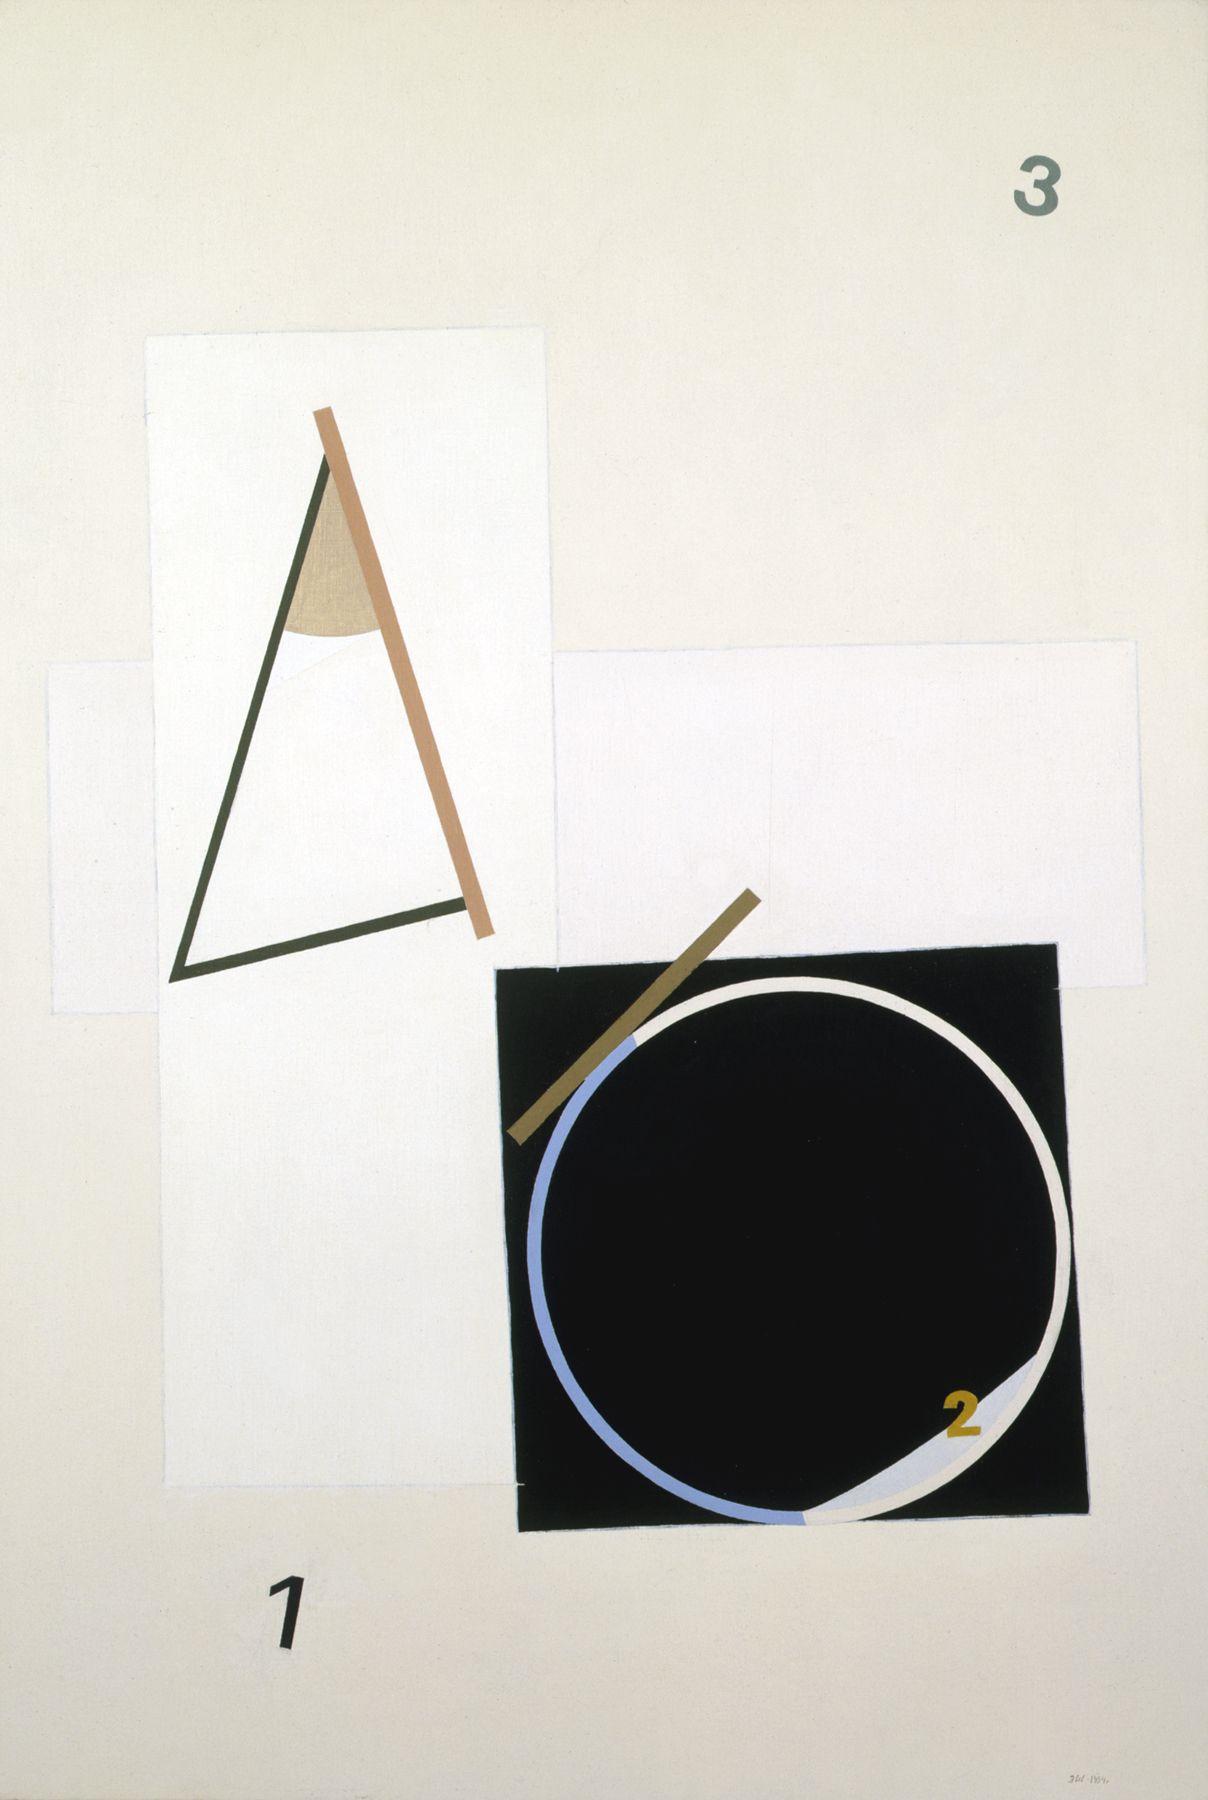 Eduard Steinberg, Composition, December 1993